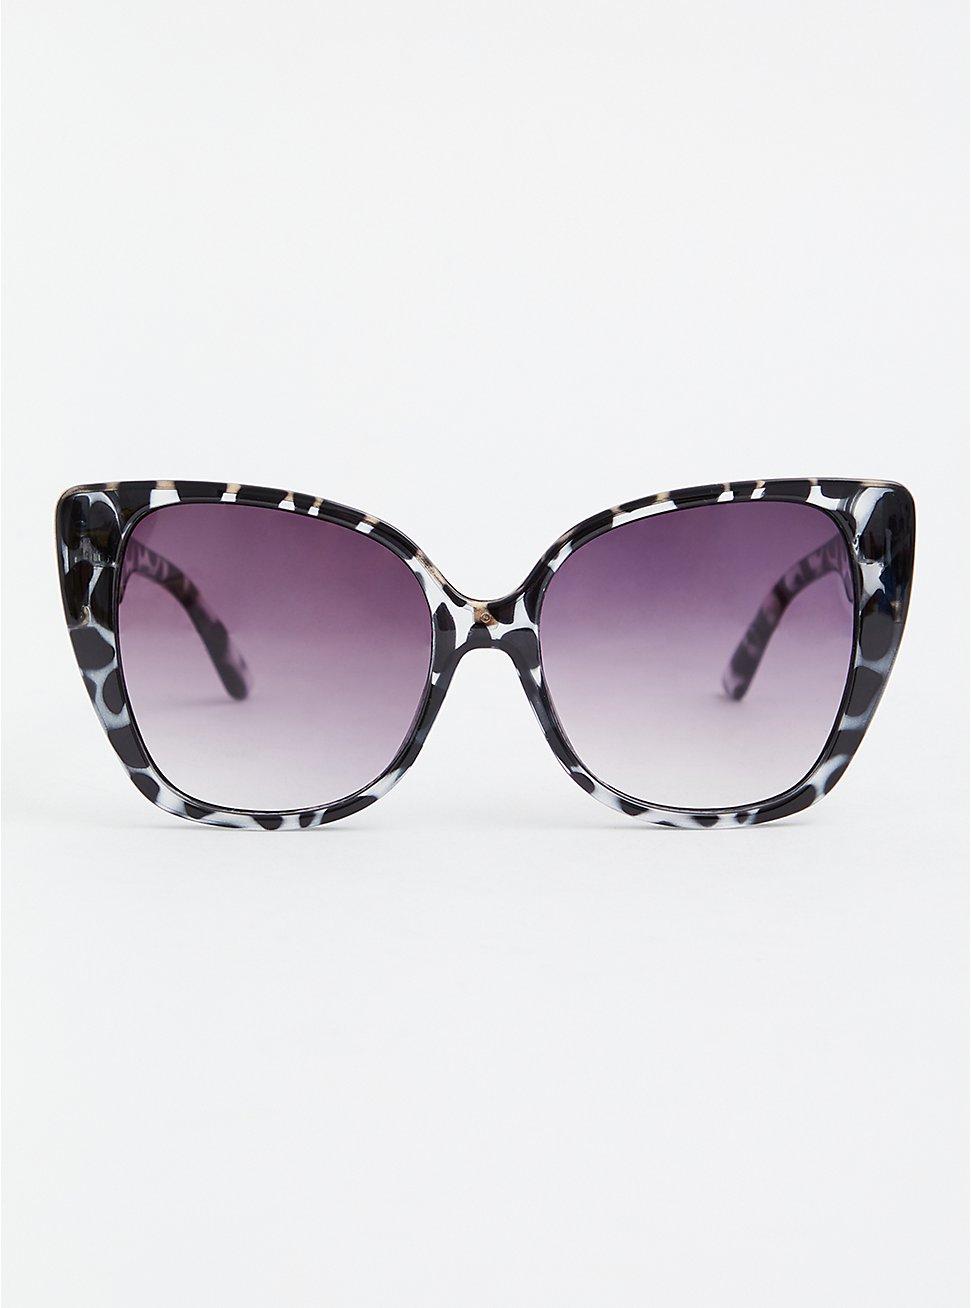 Black Tortoiseshell Cat Eye Sunglasses, , hi-res